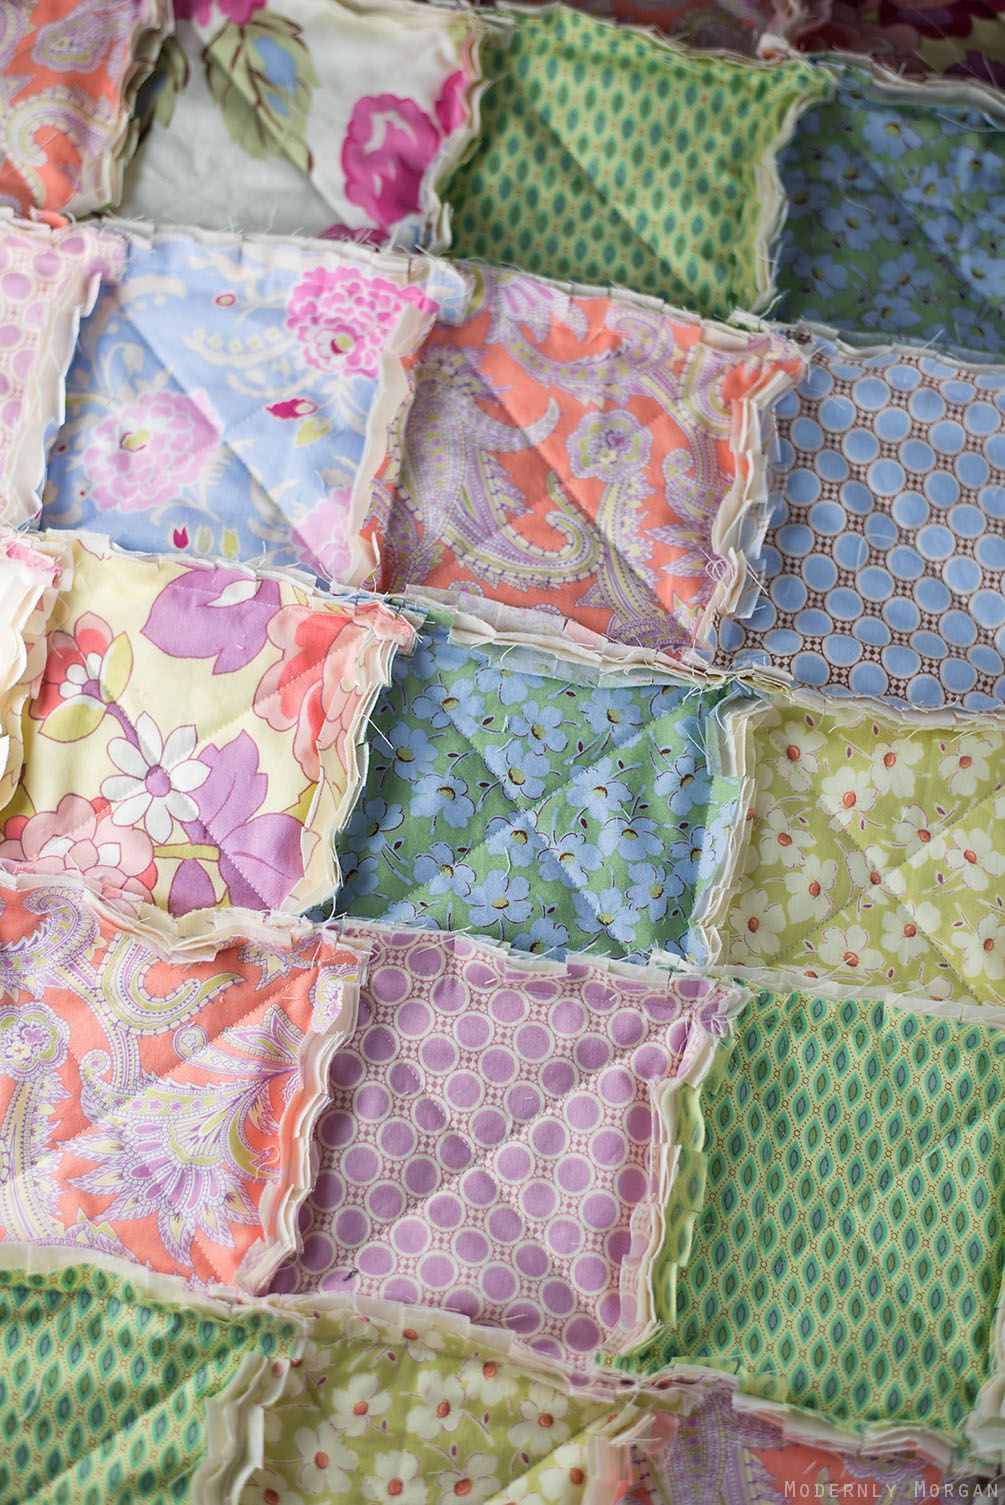 Rustic Rag Quilt Tutorial Modernly Morgan Rag Quilt Tutorial Rag Quilt Patterns Baby Rag Quilts